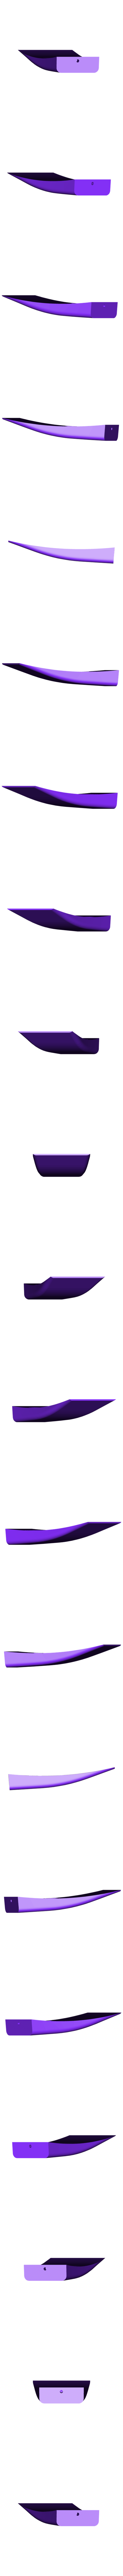 OpenRC_2017_MCL_Front_Color2.stl Download free STL file OpenRC F1 Dual Color McLaren Edition • 3D printer model, DanielNoree